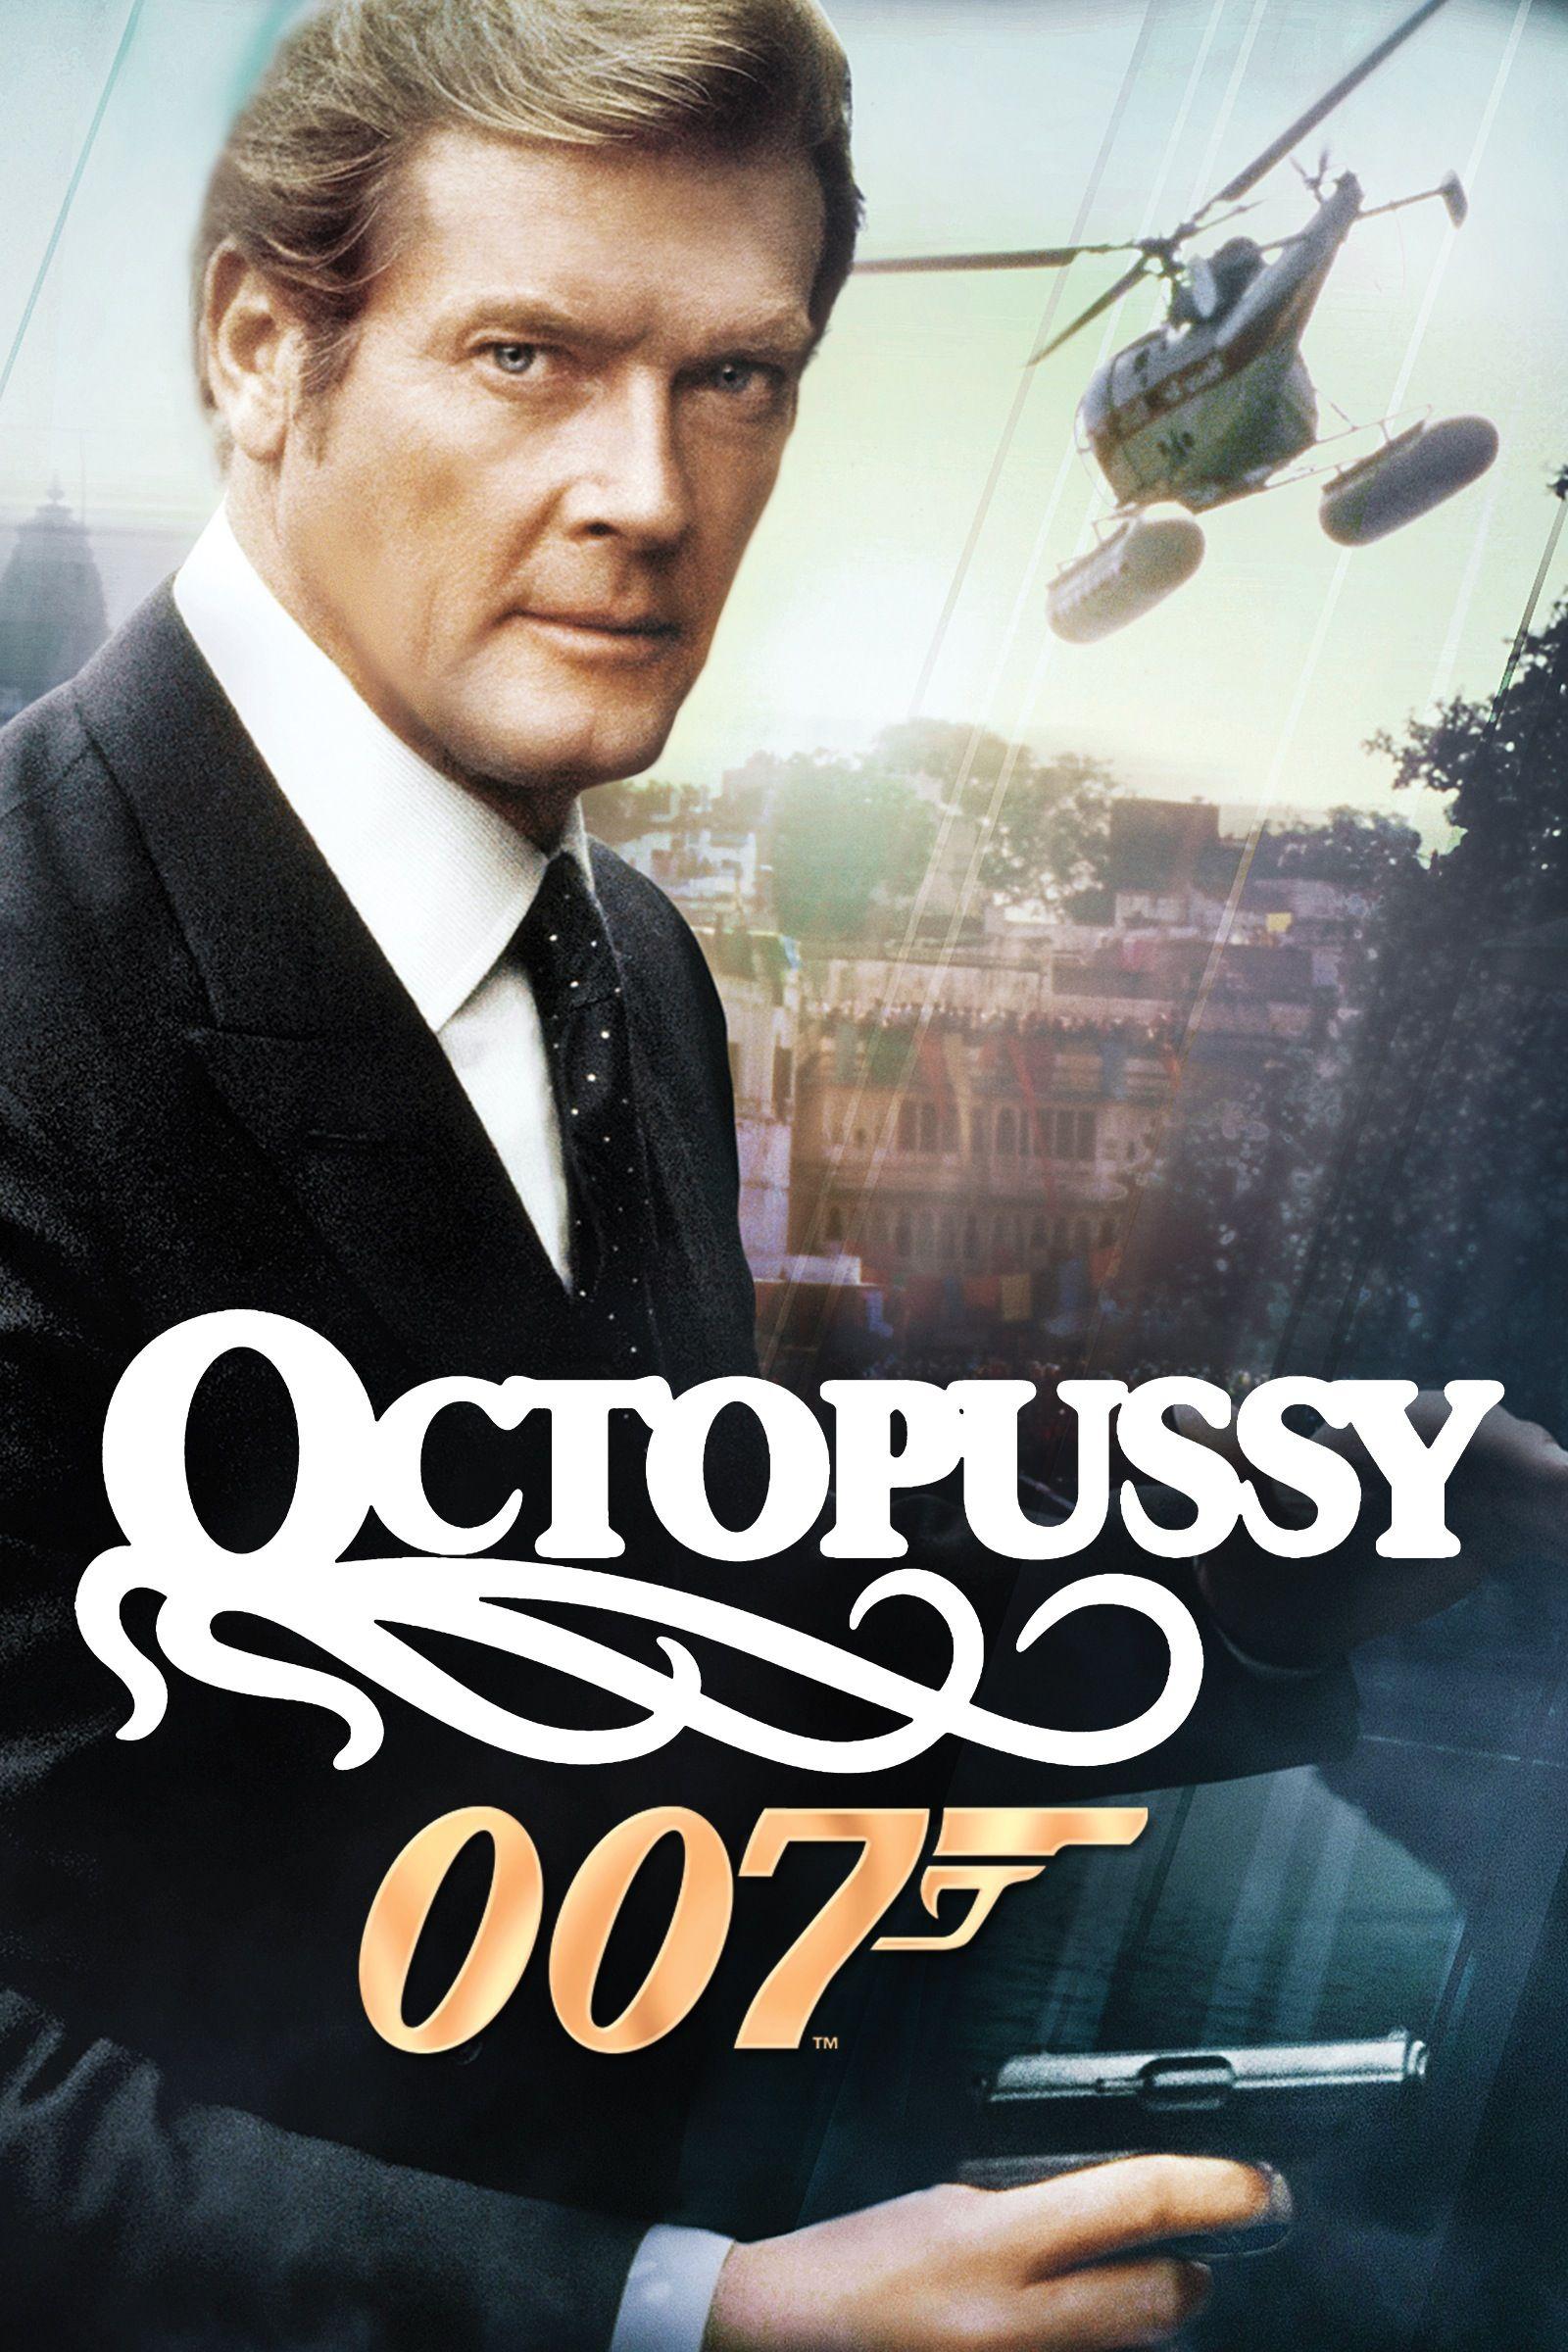 Octopussy Https Itunes Apple Com Us Movie Octopussy Id561577625 James Bond Movie Posters James Bond Movies James Bond